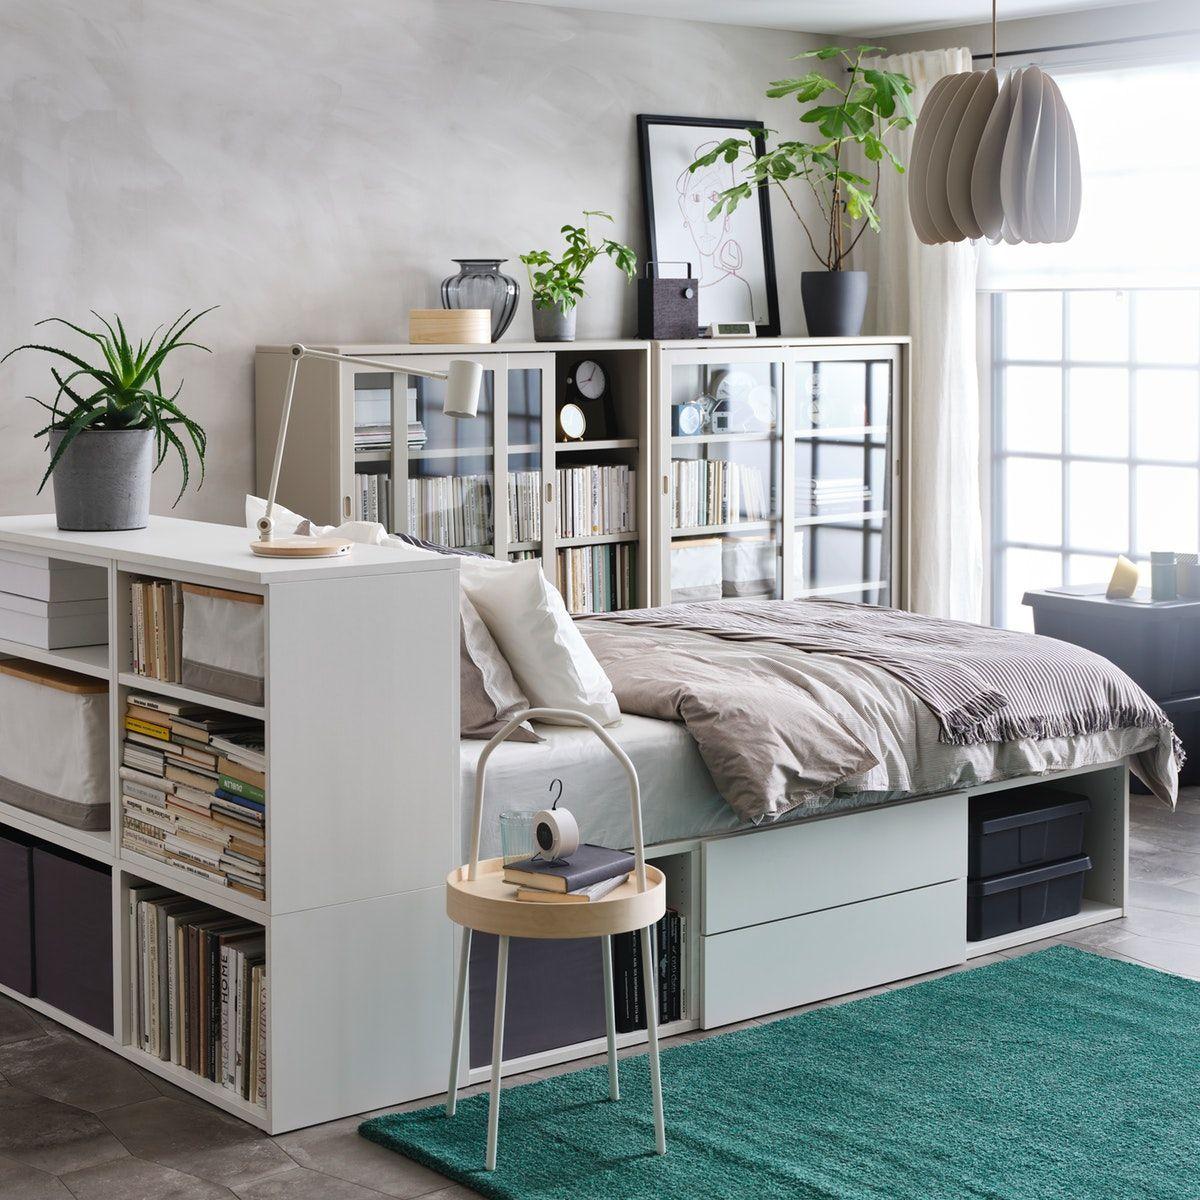 Lit Platsa Deco Petite Chambre Amenagement Chambre Decoration Petite Chambre